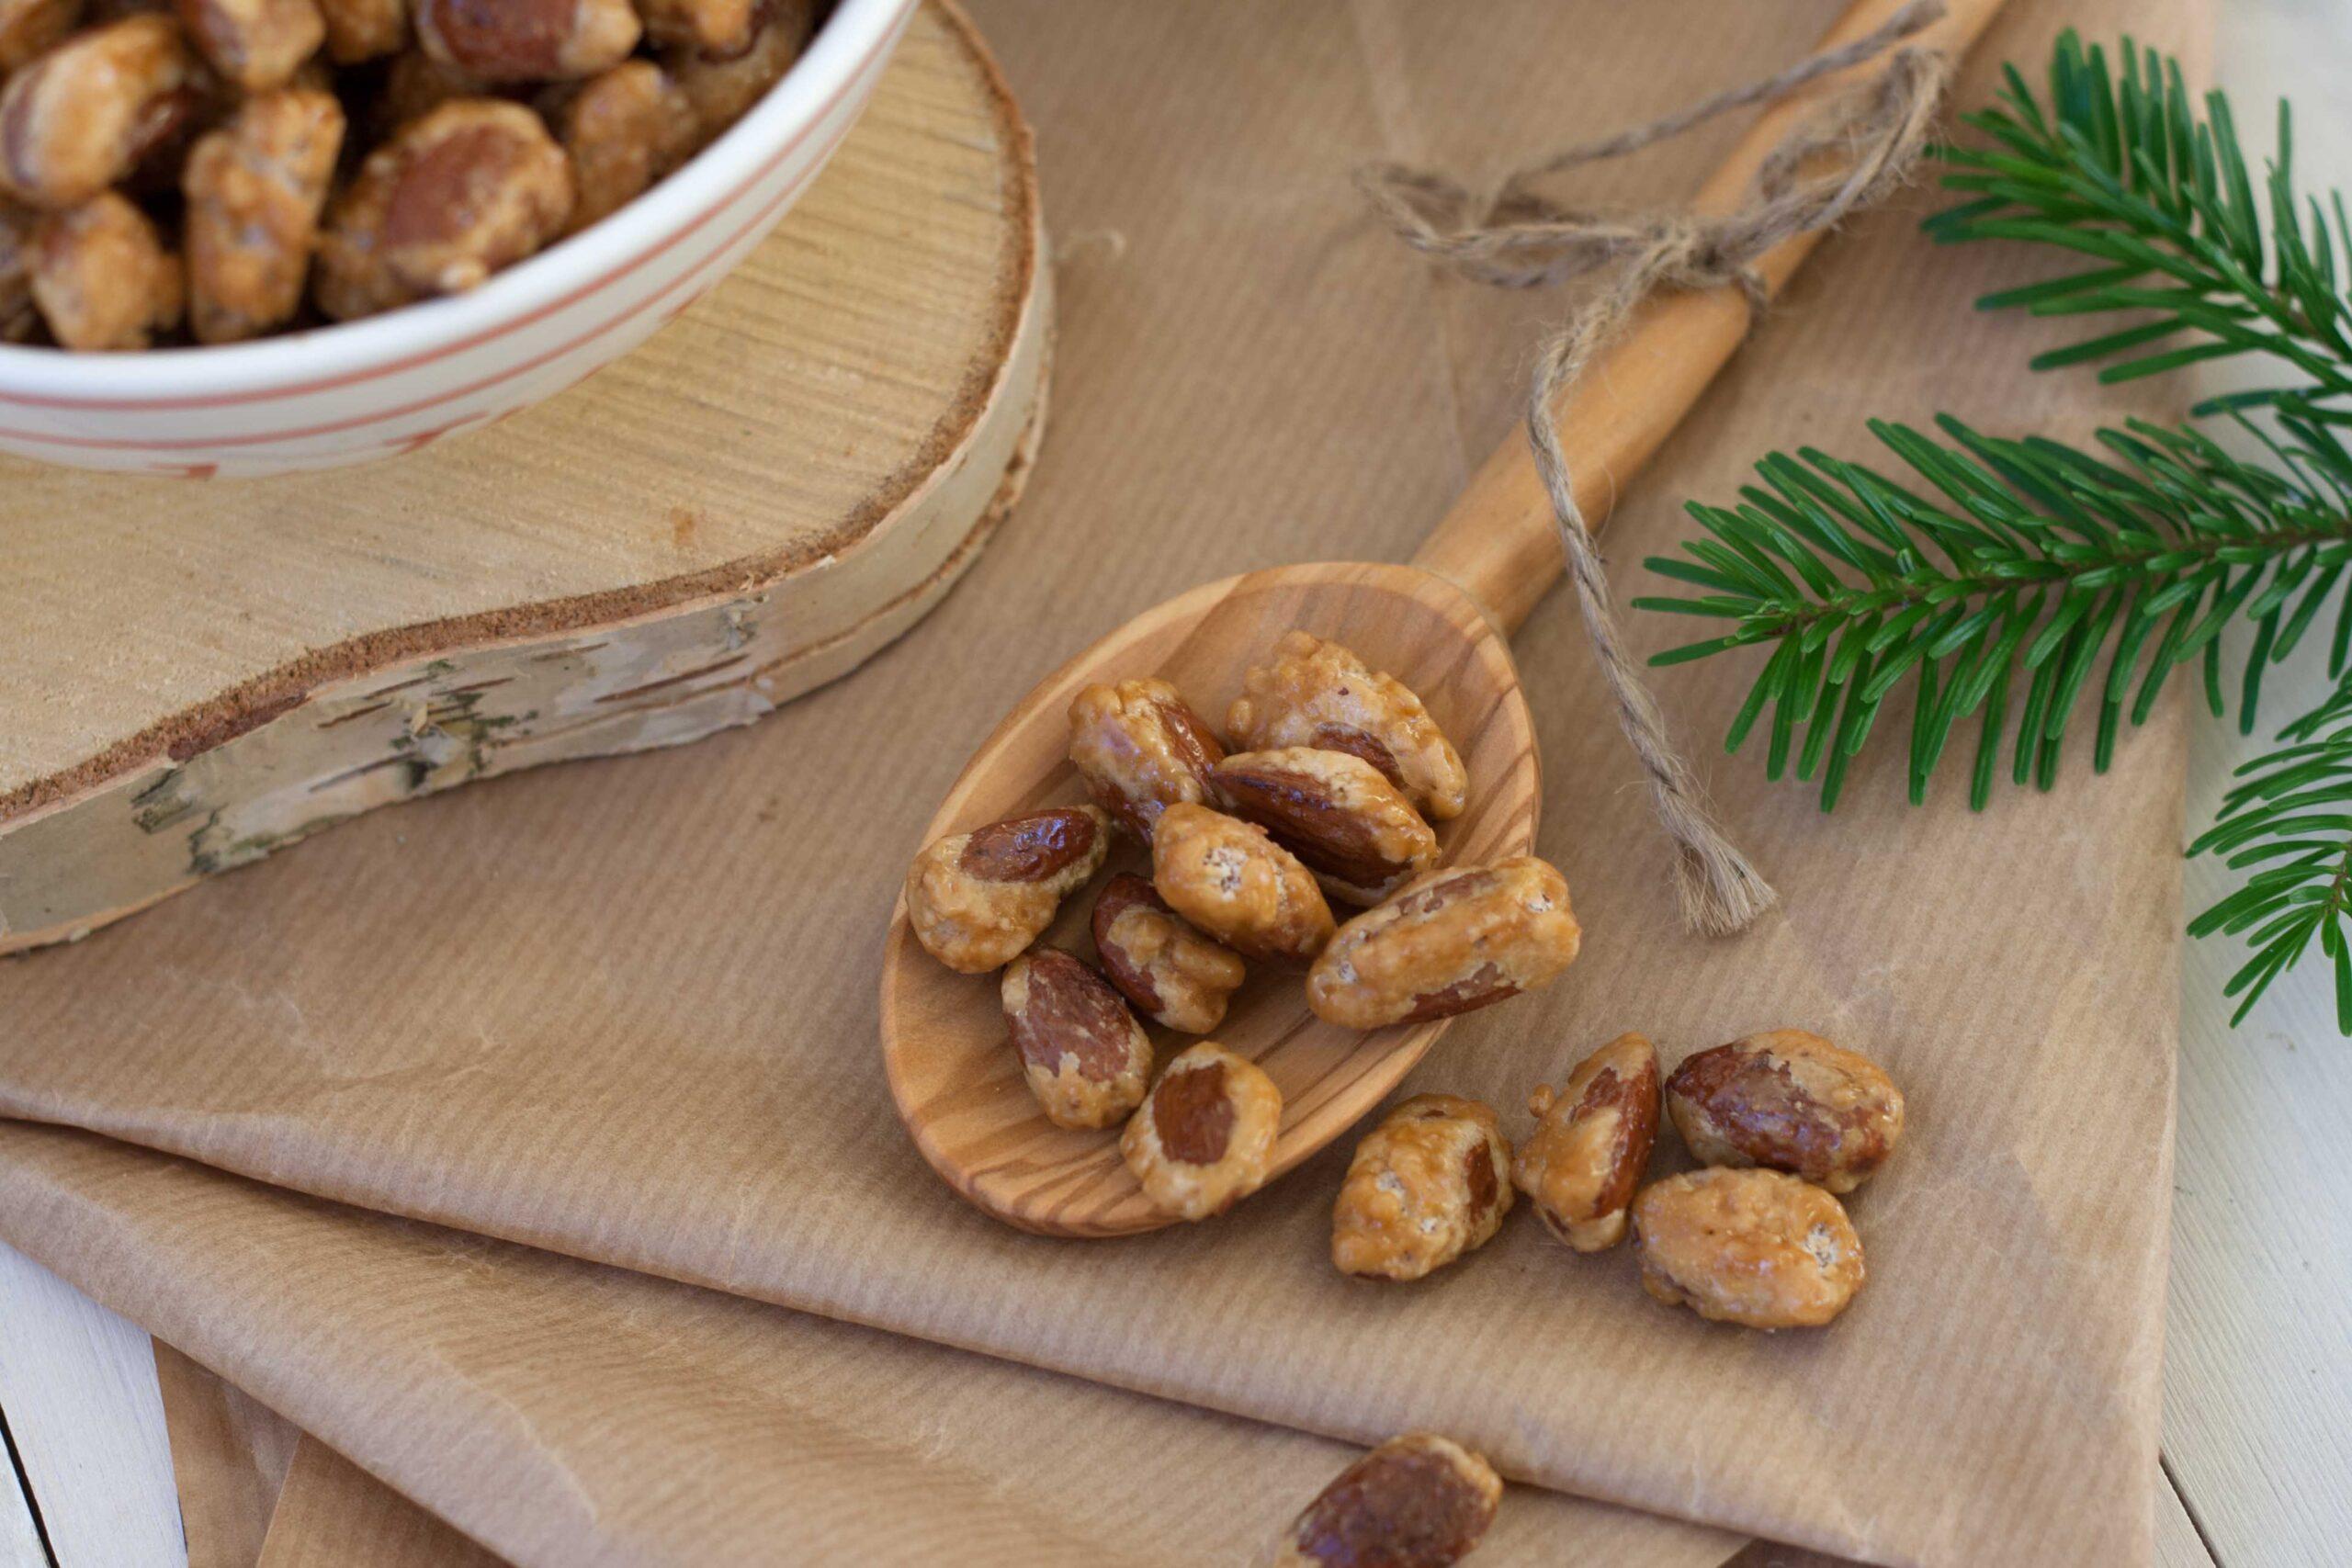 Recipe for Nordic Sugar Roasted Almonds